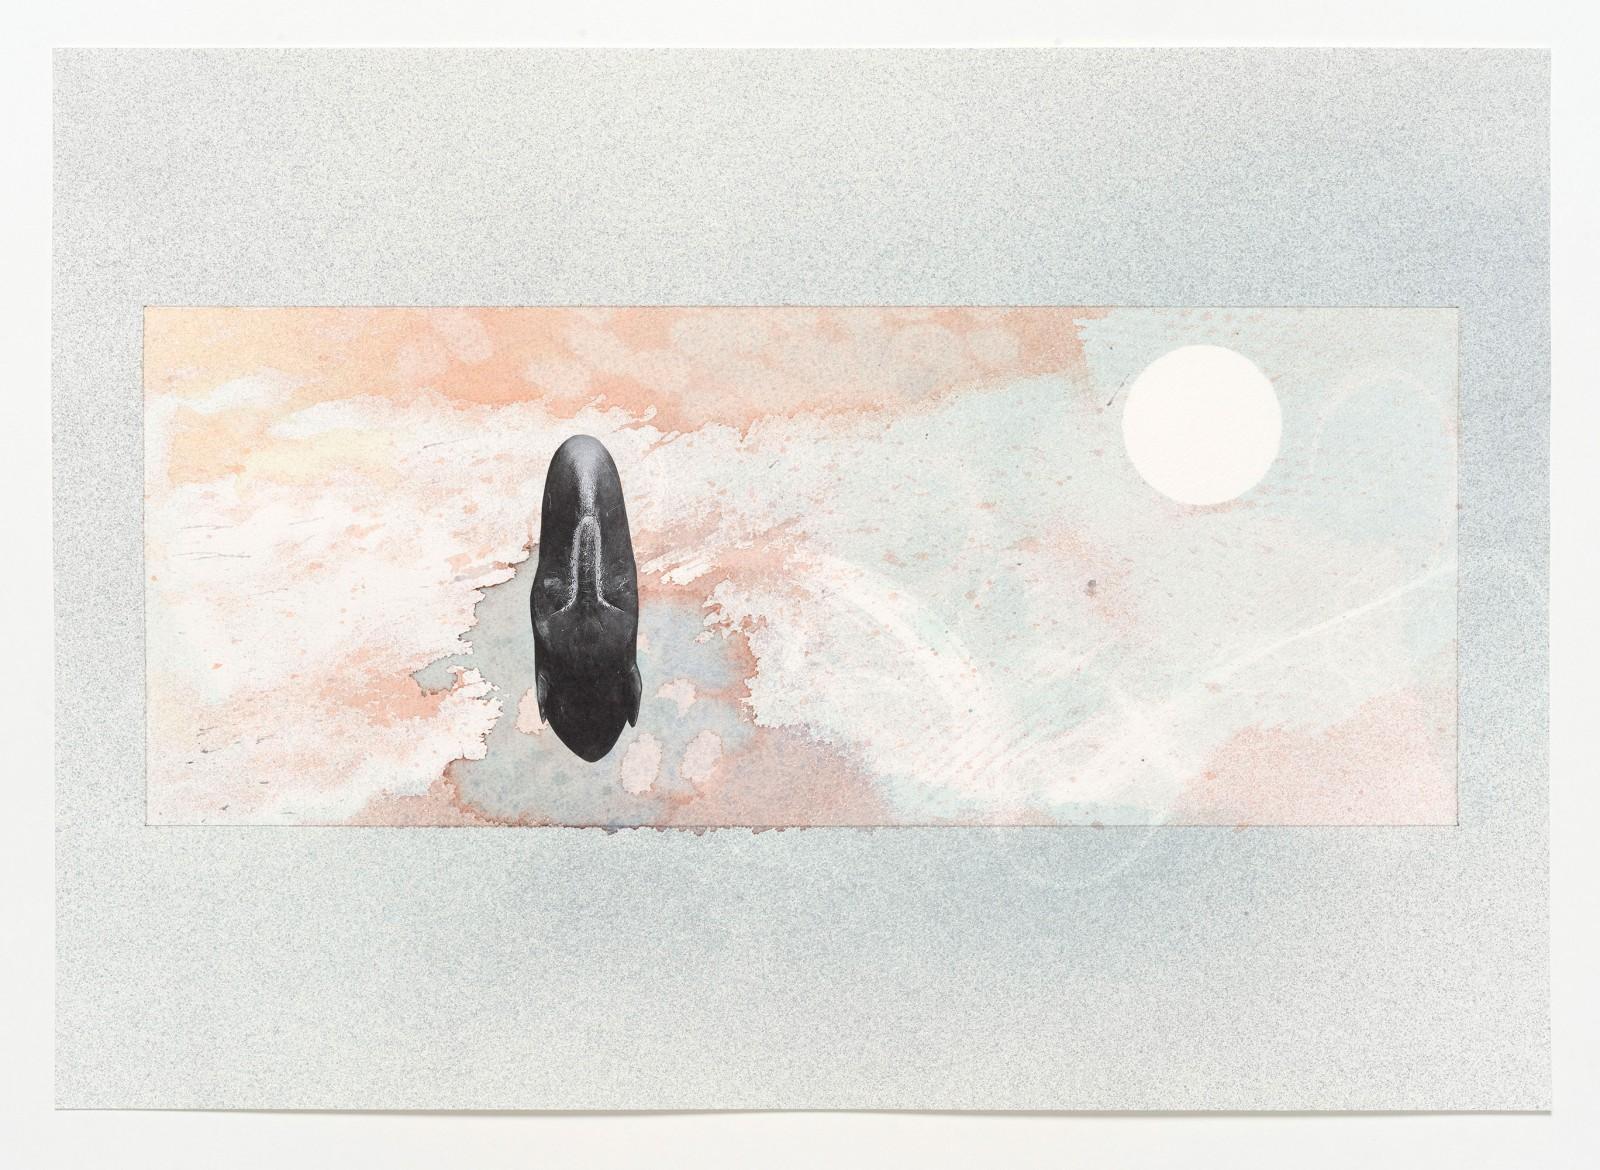 Kim Nekarda: untitled, 2019, photocopy & watercolour on paper, 41 x 58 cm